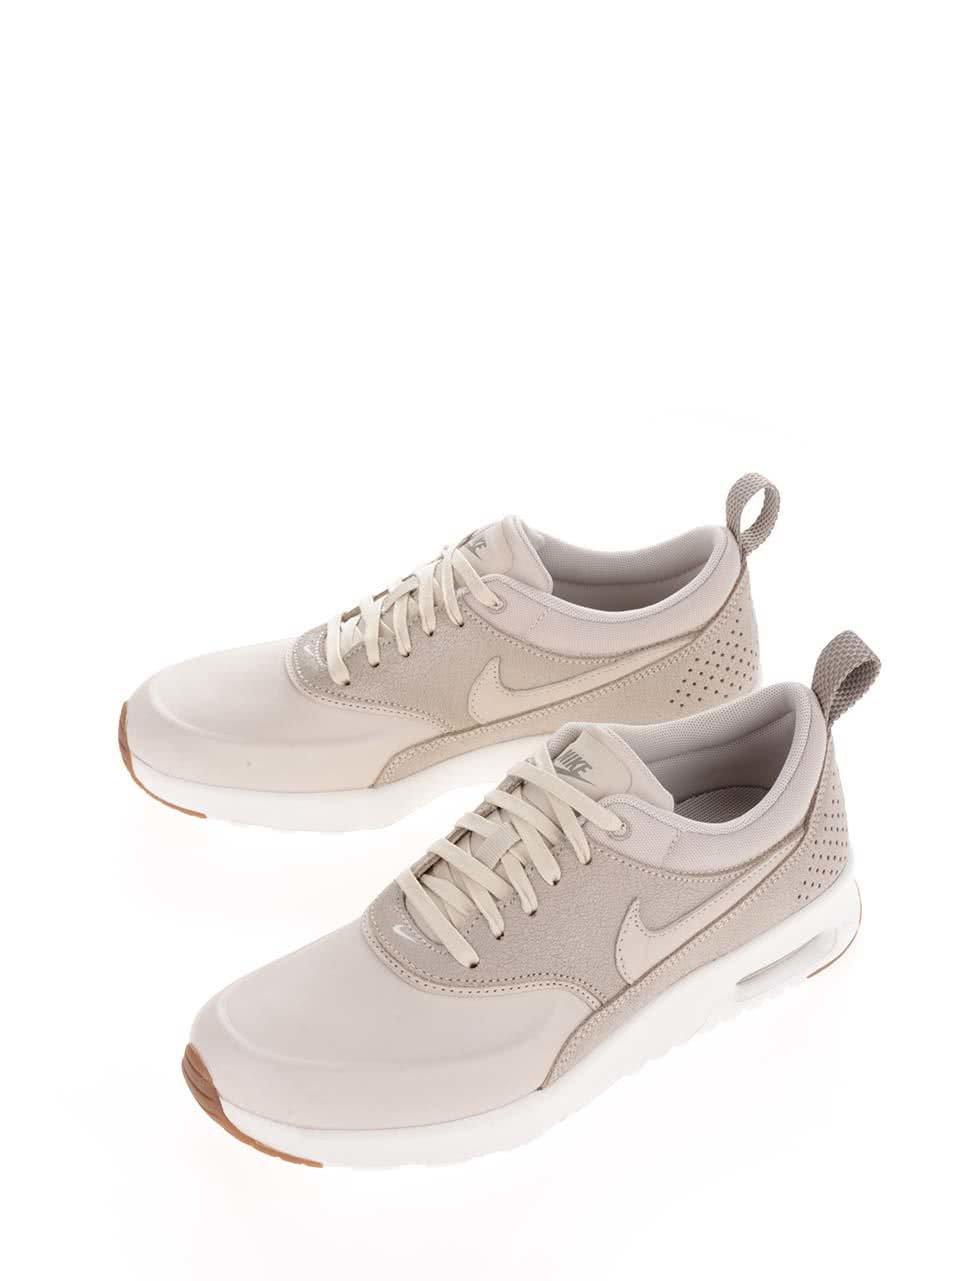 3335548b8 Pantofi sport bej Nike Air Max Thea Premium | ZOOT.ro